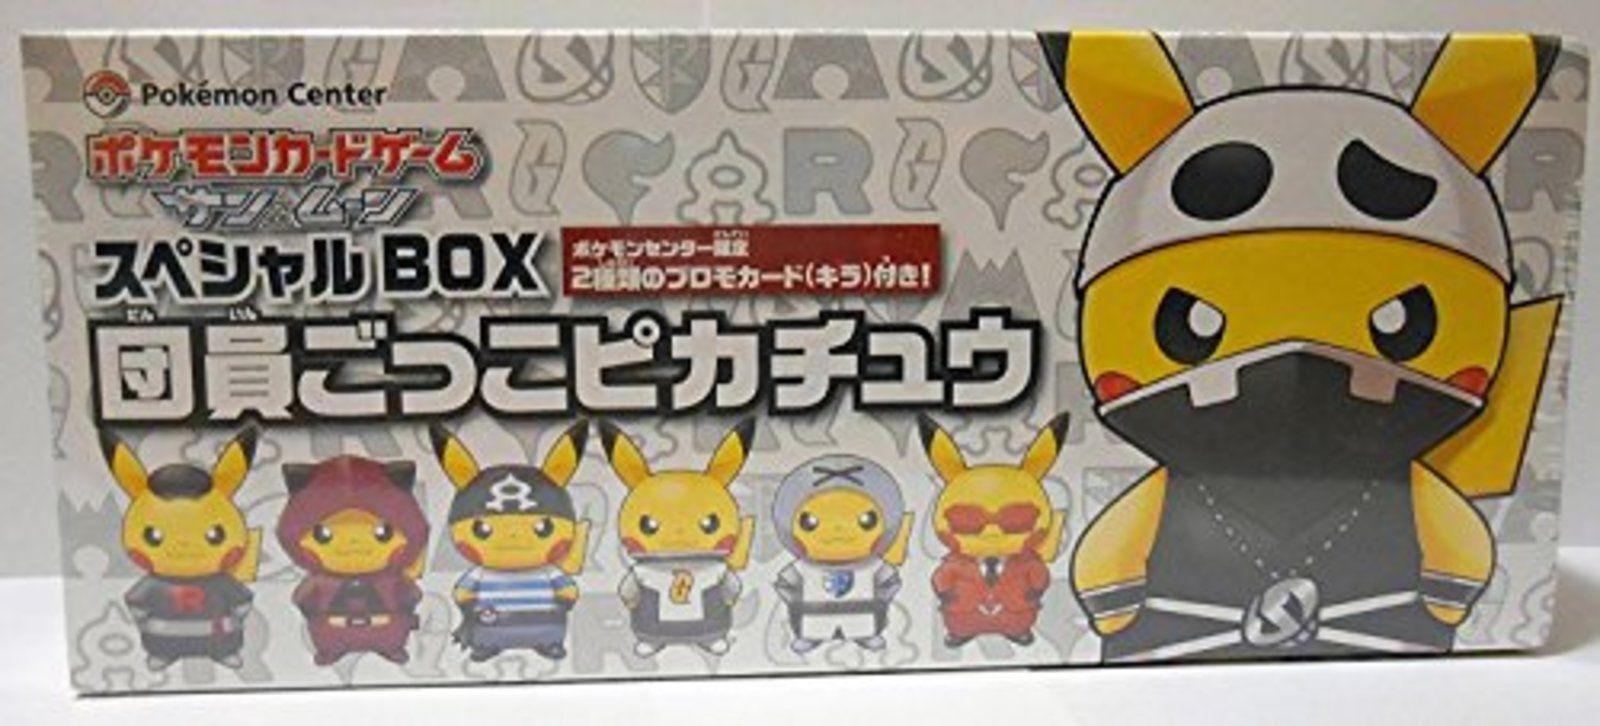 Pokemon Center Center Center Japan Team Skull Pikachu Cosplay Box + Japanese CP6 Booster Box c71830